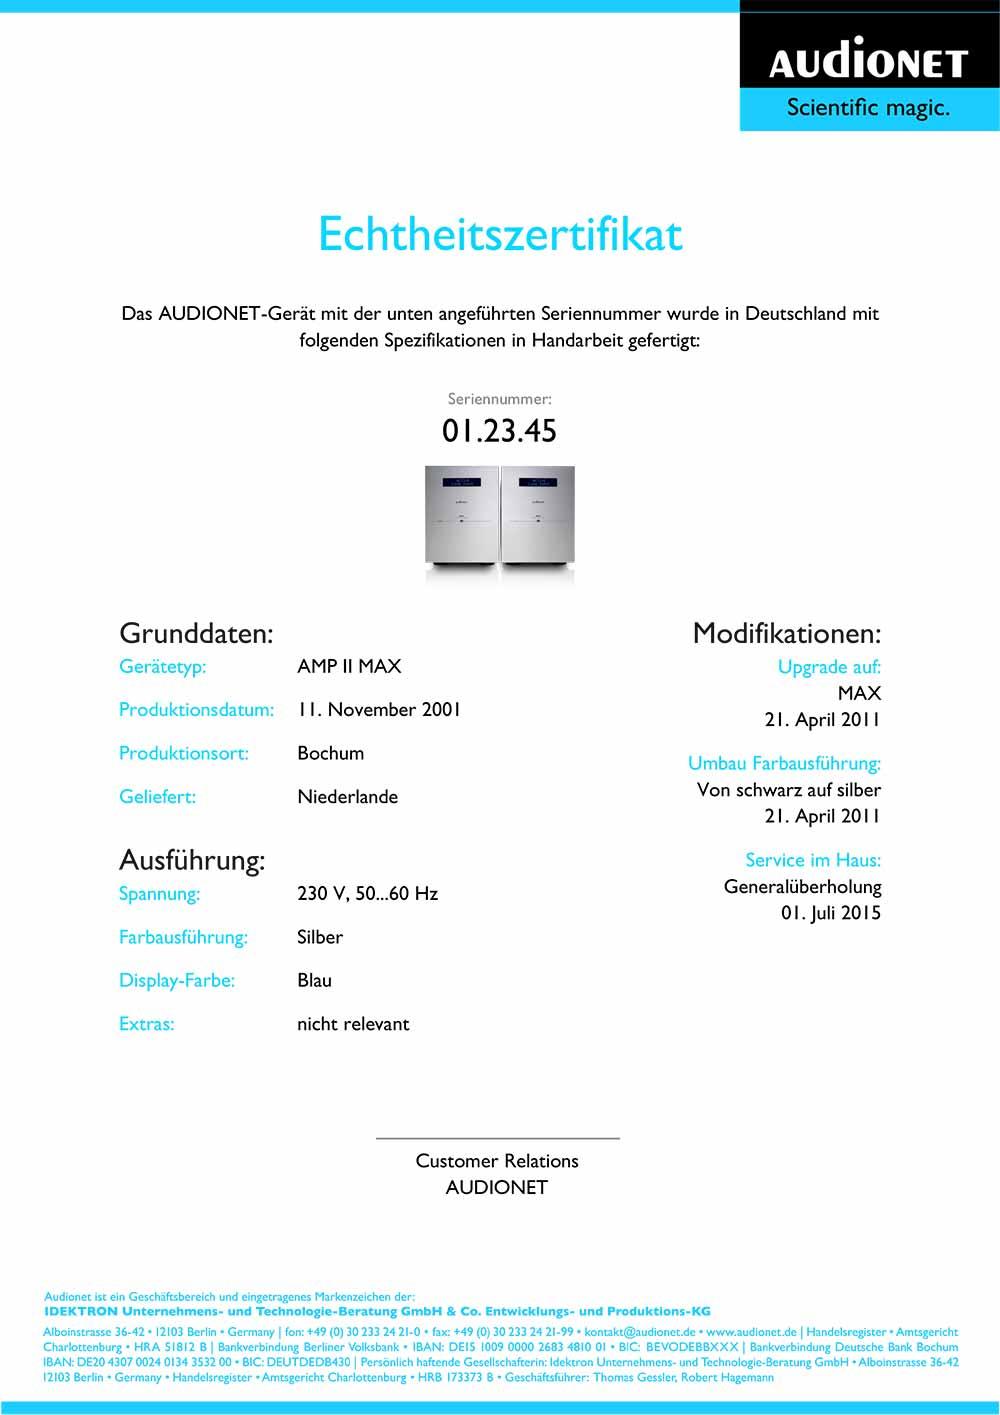 Audionet Echtheitszertifikat – AUDIONET – Scientific magic.